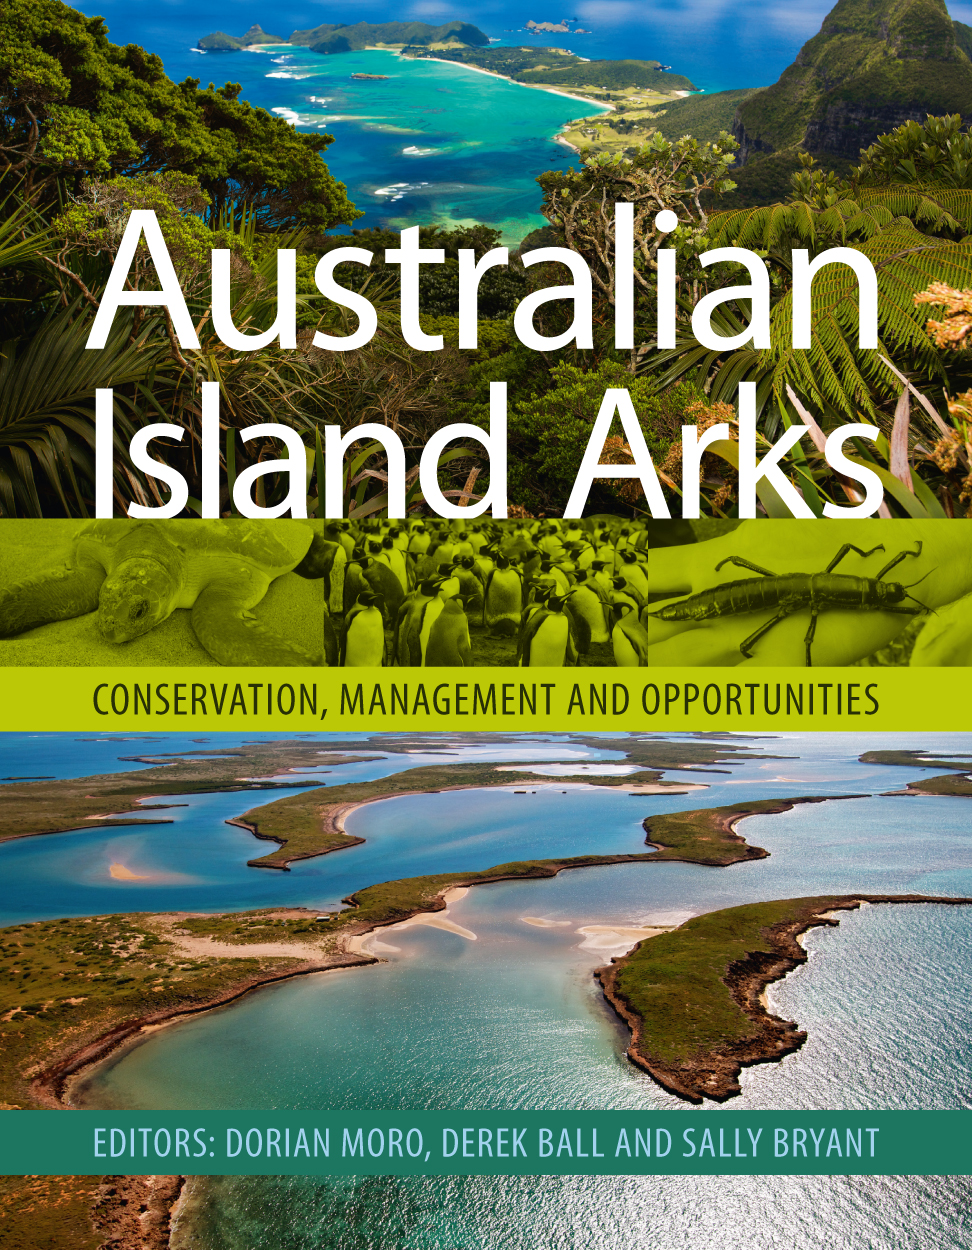 Download Ebook Australian Island Arks by Dorian Moro Pdf